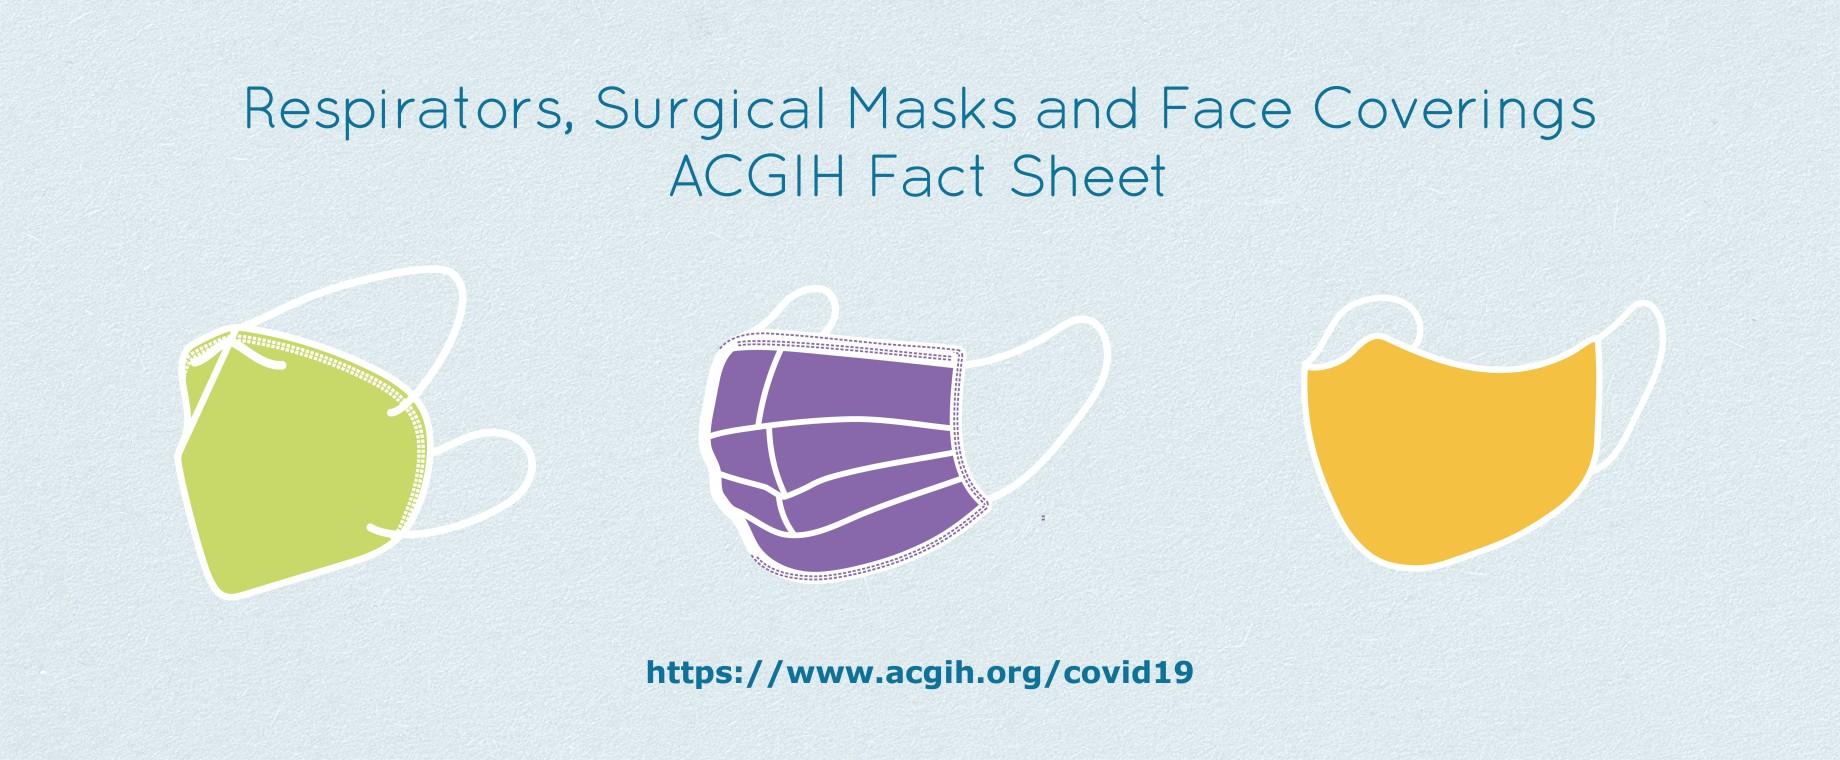 acgih-respirators_fact-sheet_slide.jpg